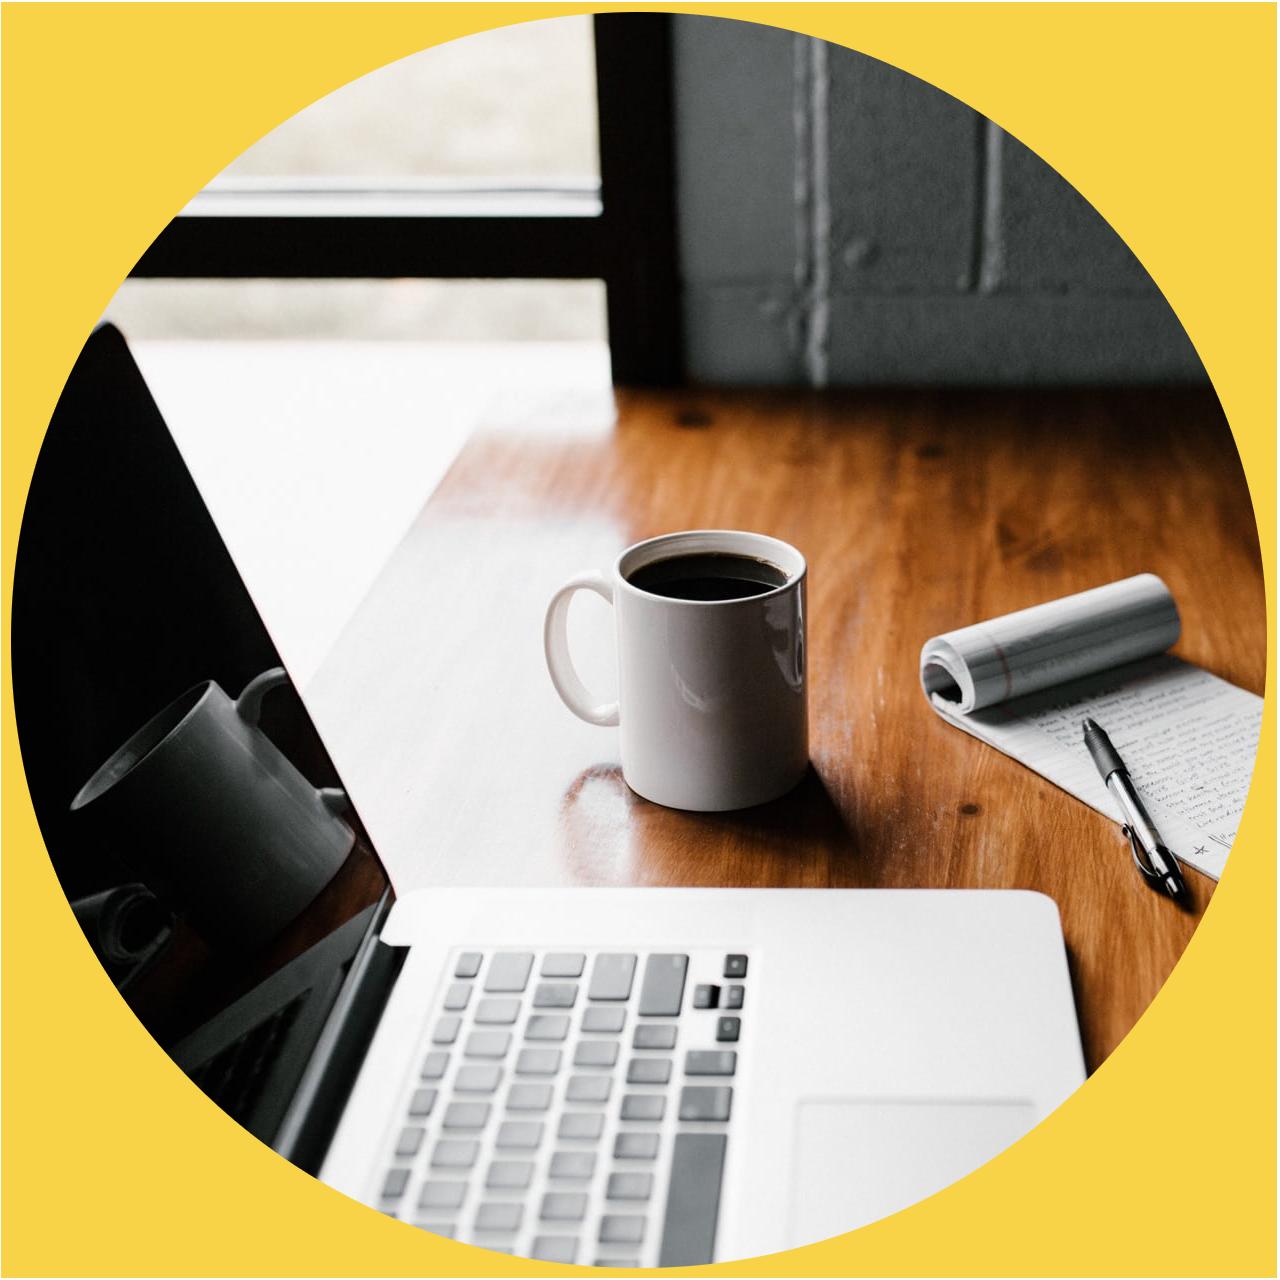 Mug, laptop, and notebook on a desk